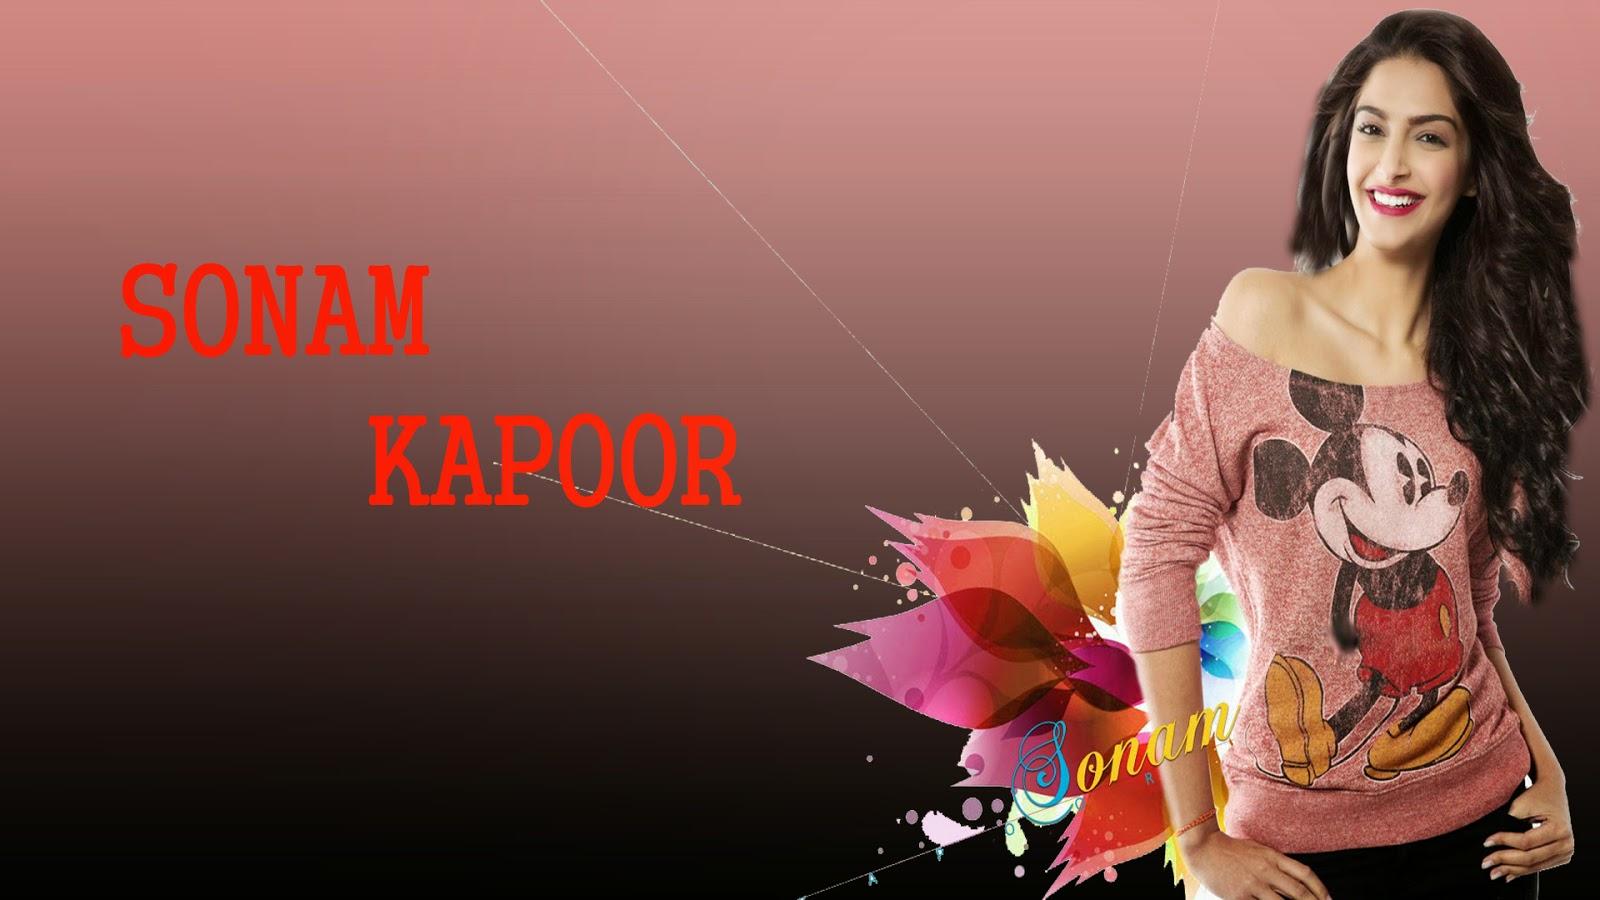 Sonam Kapoor Wallpapers: Global Pictures Gallery: Sonam Kapoor Full HD Wallpapers